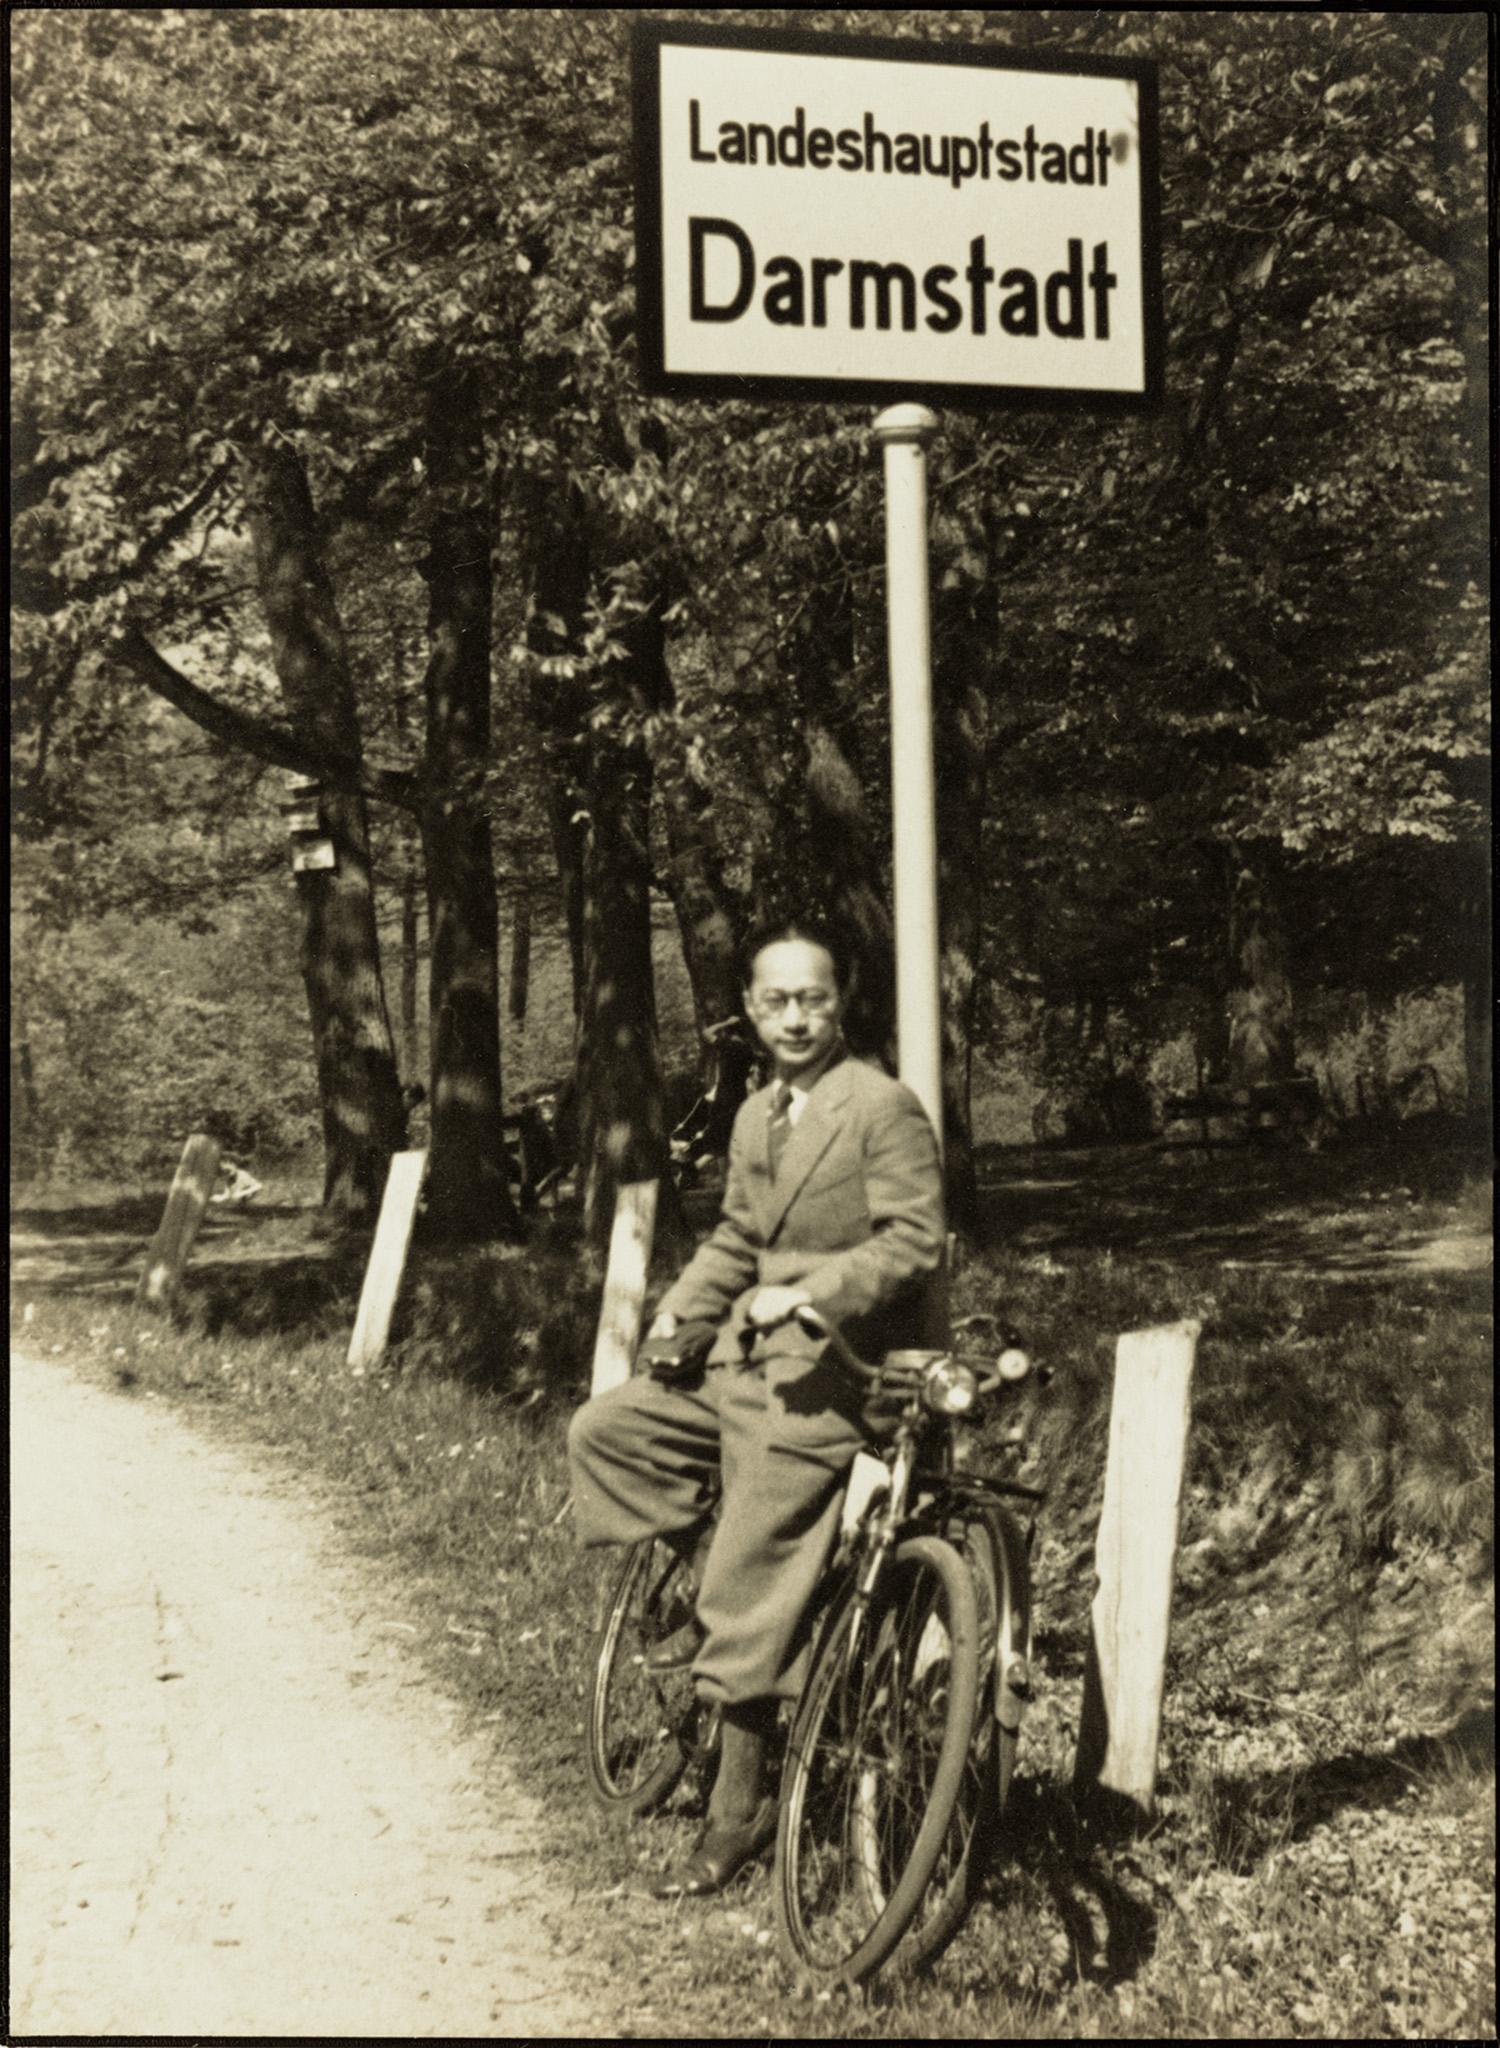 留学达城自拍像, Self-portrait in Darmstadt, 1939 / Courtesy of Jin Hua